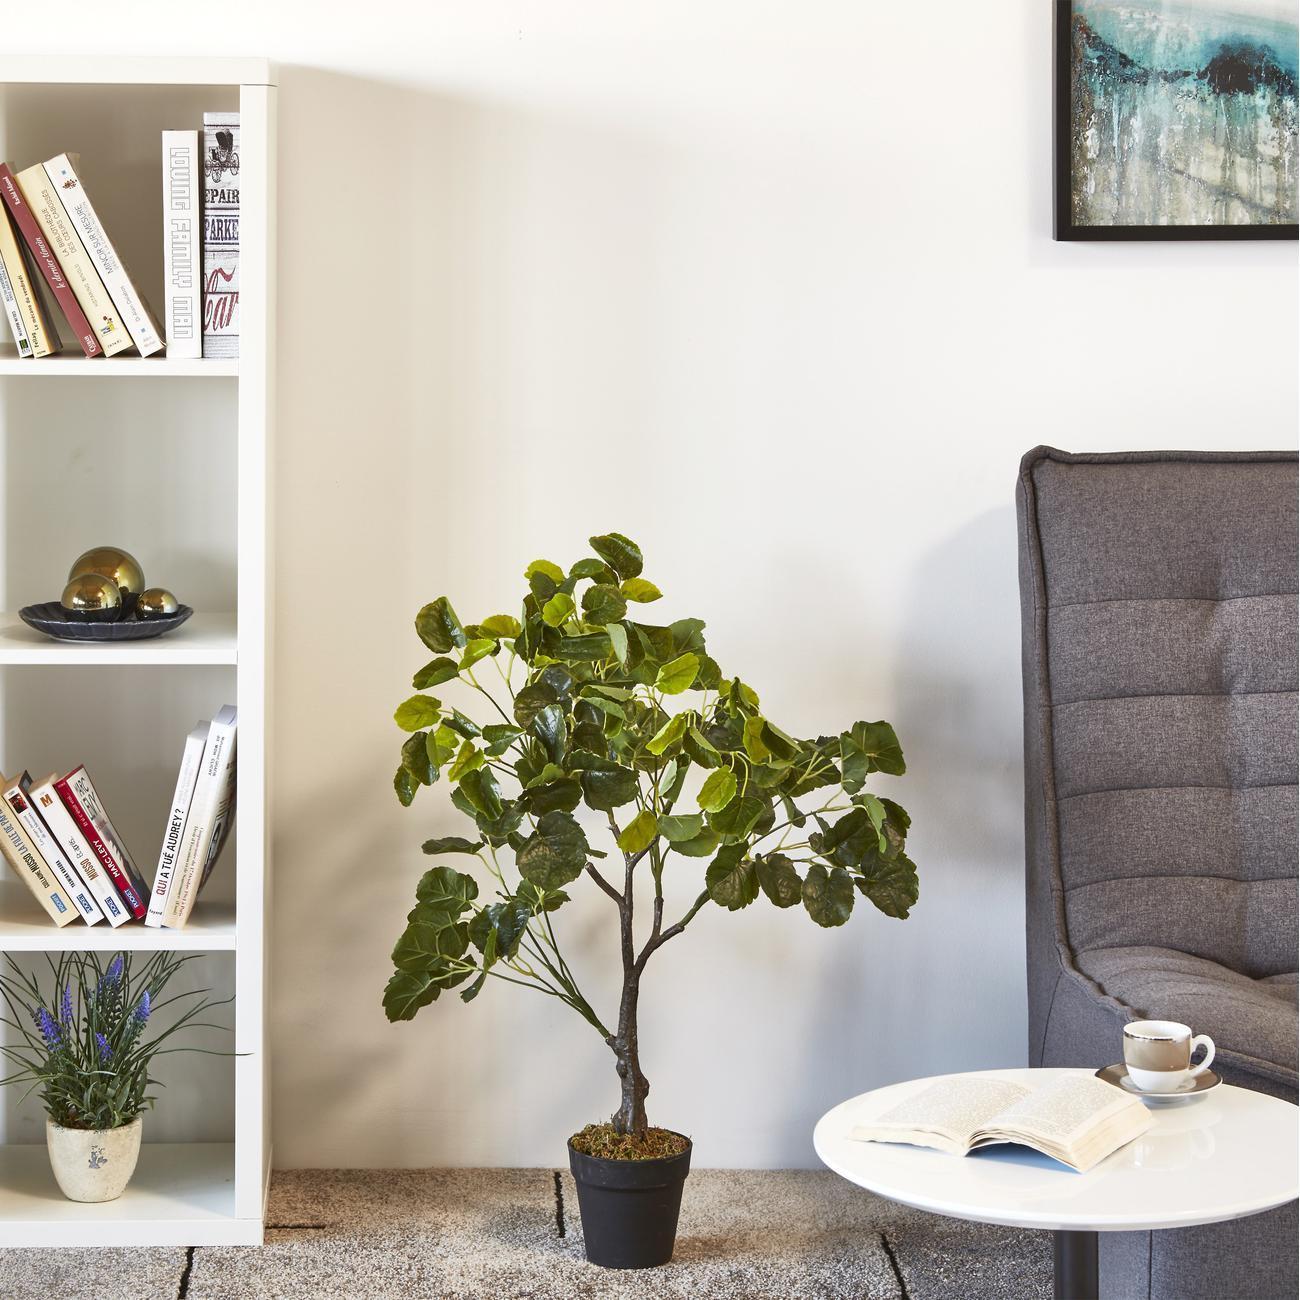 Plante artificielle OLLA 210 feuilles